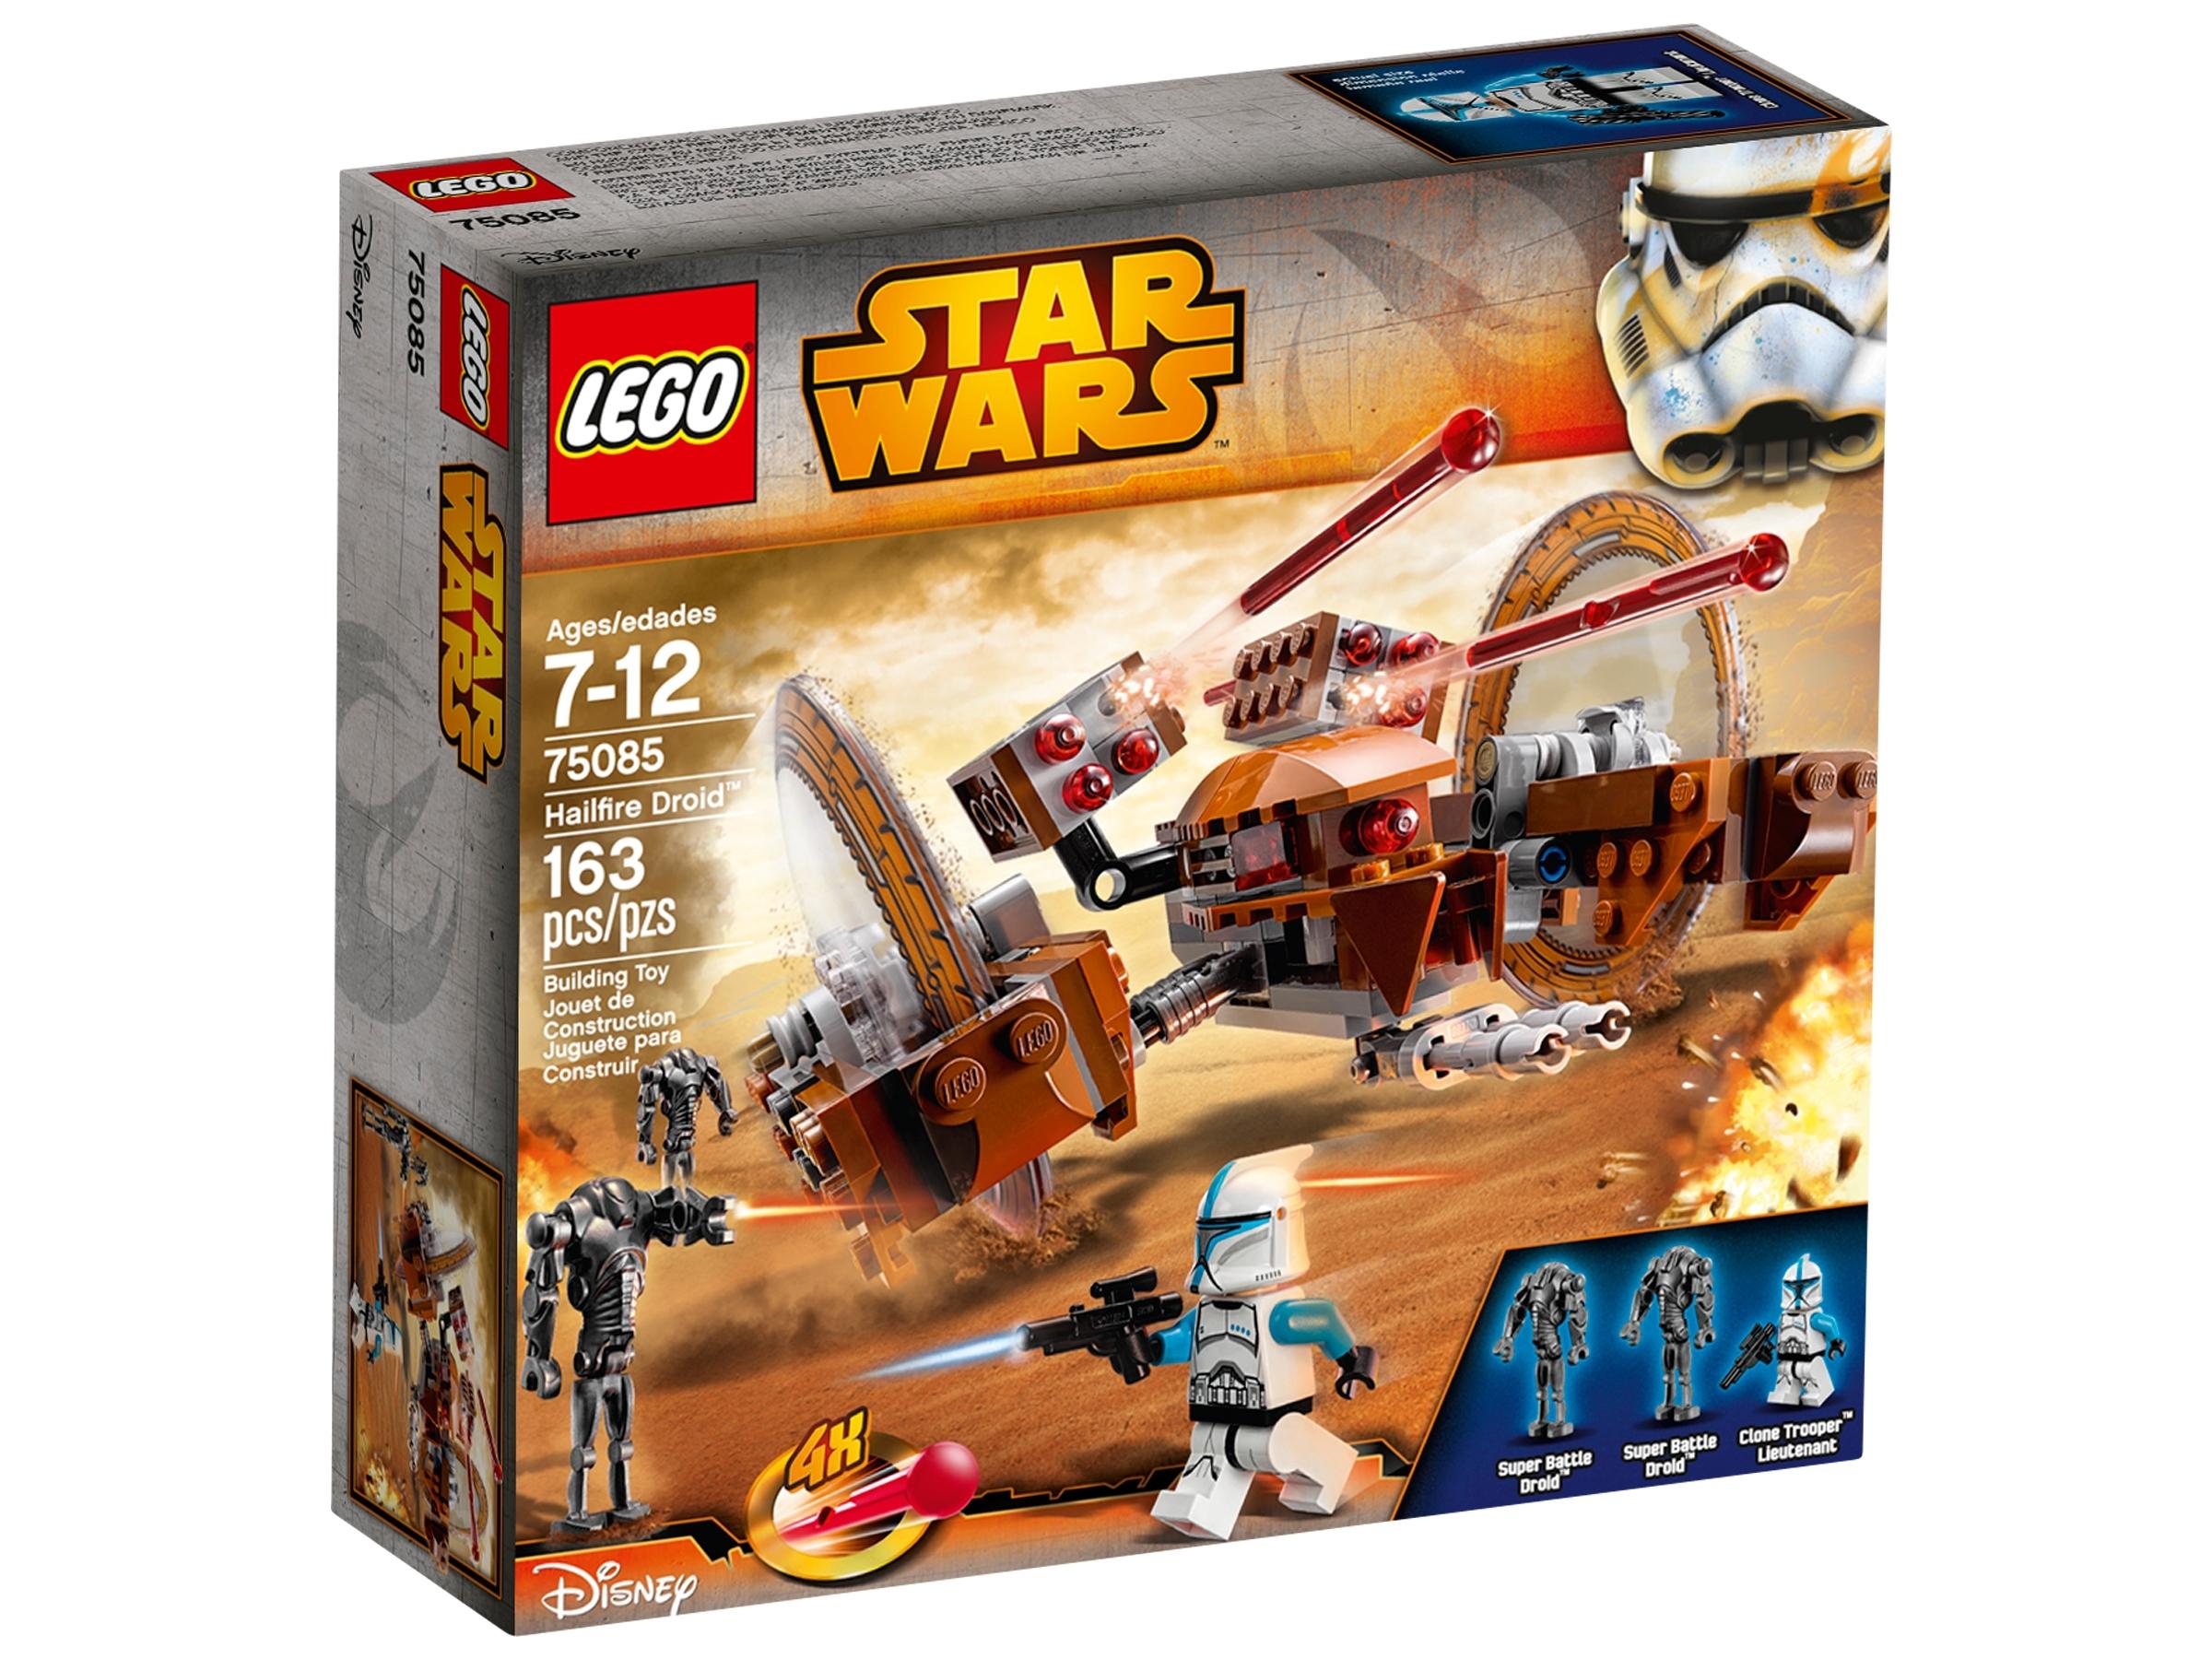 LEGO Star Wars 75085 Hailfire Droid Instruction Manual Only